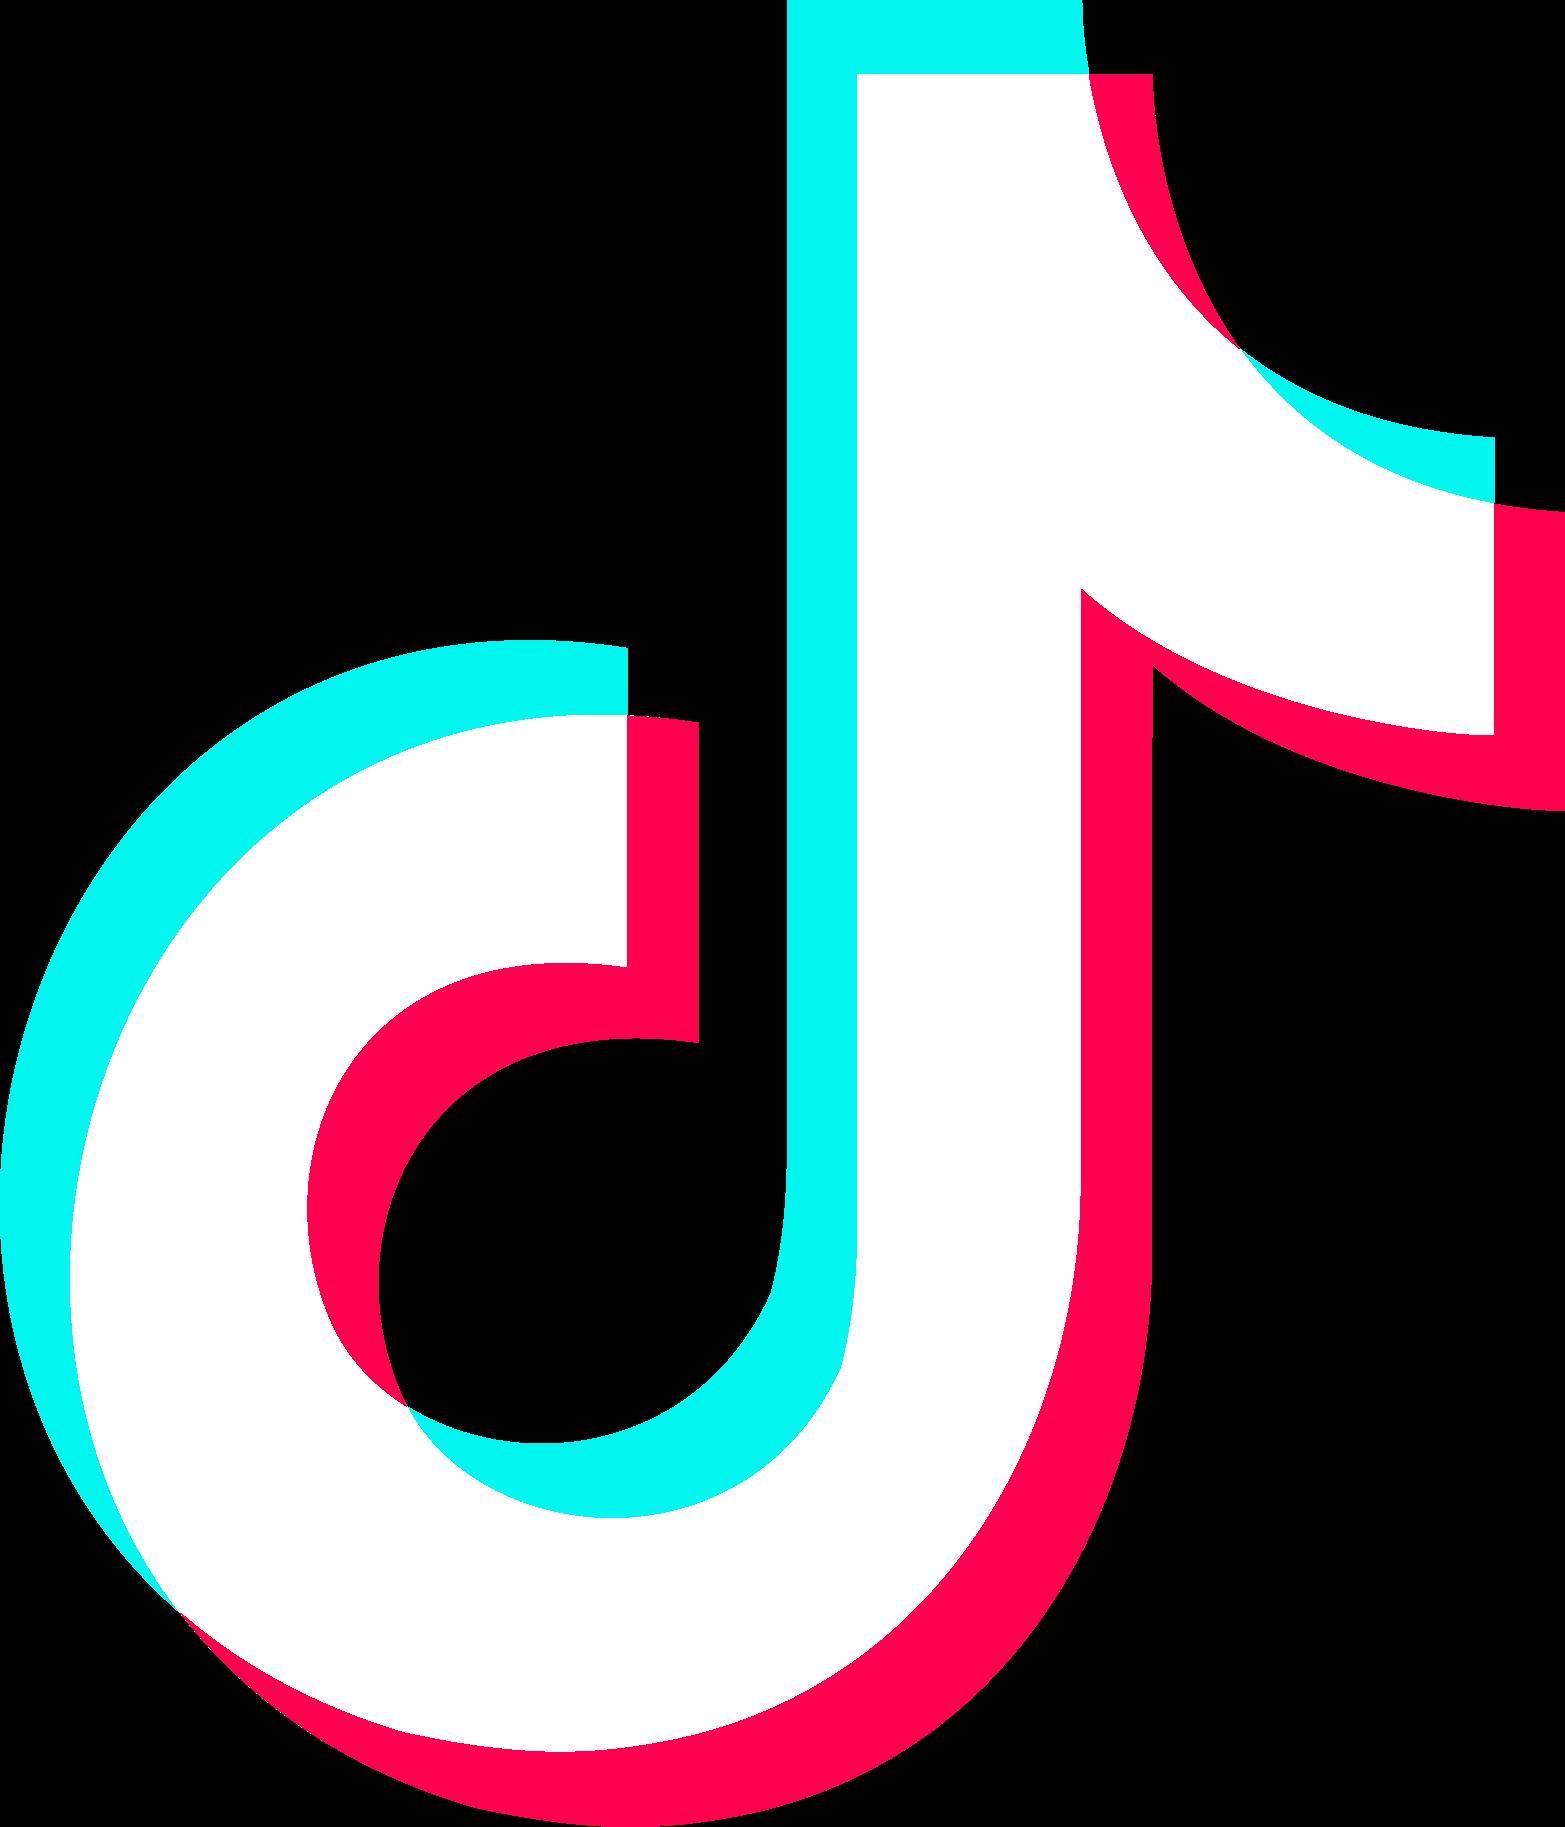 Logo de Tik Tok PNG (Sin fondo)